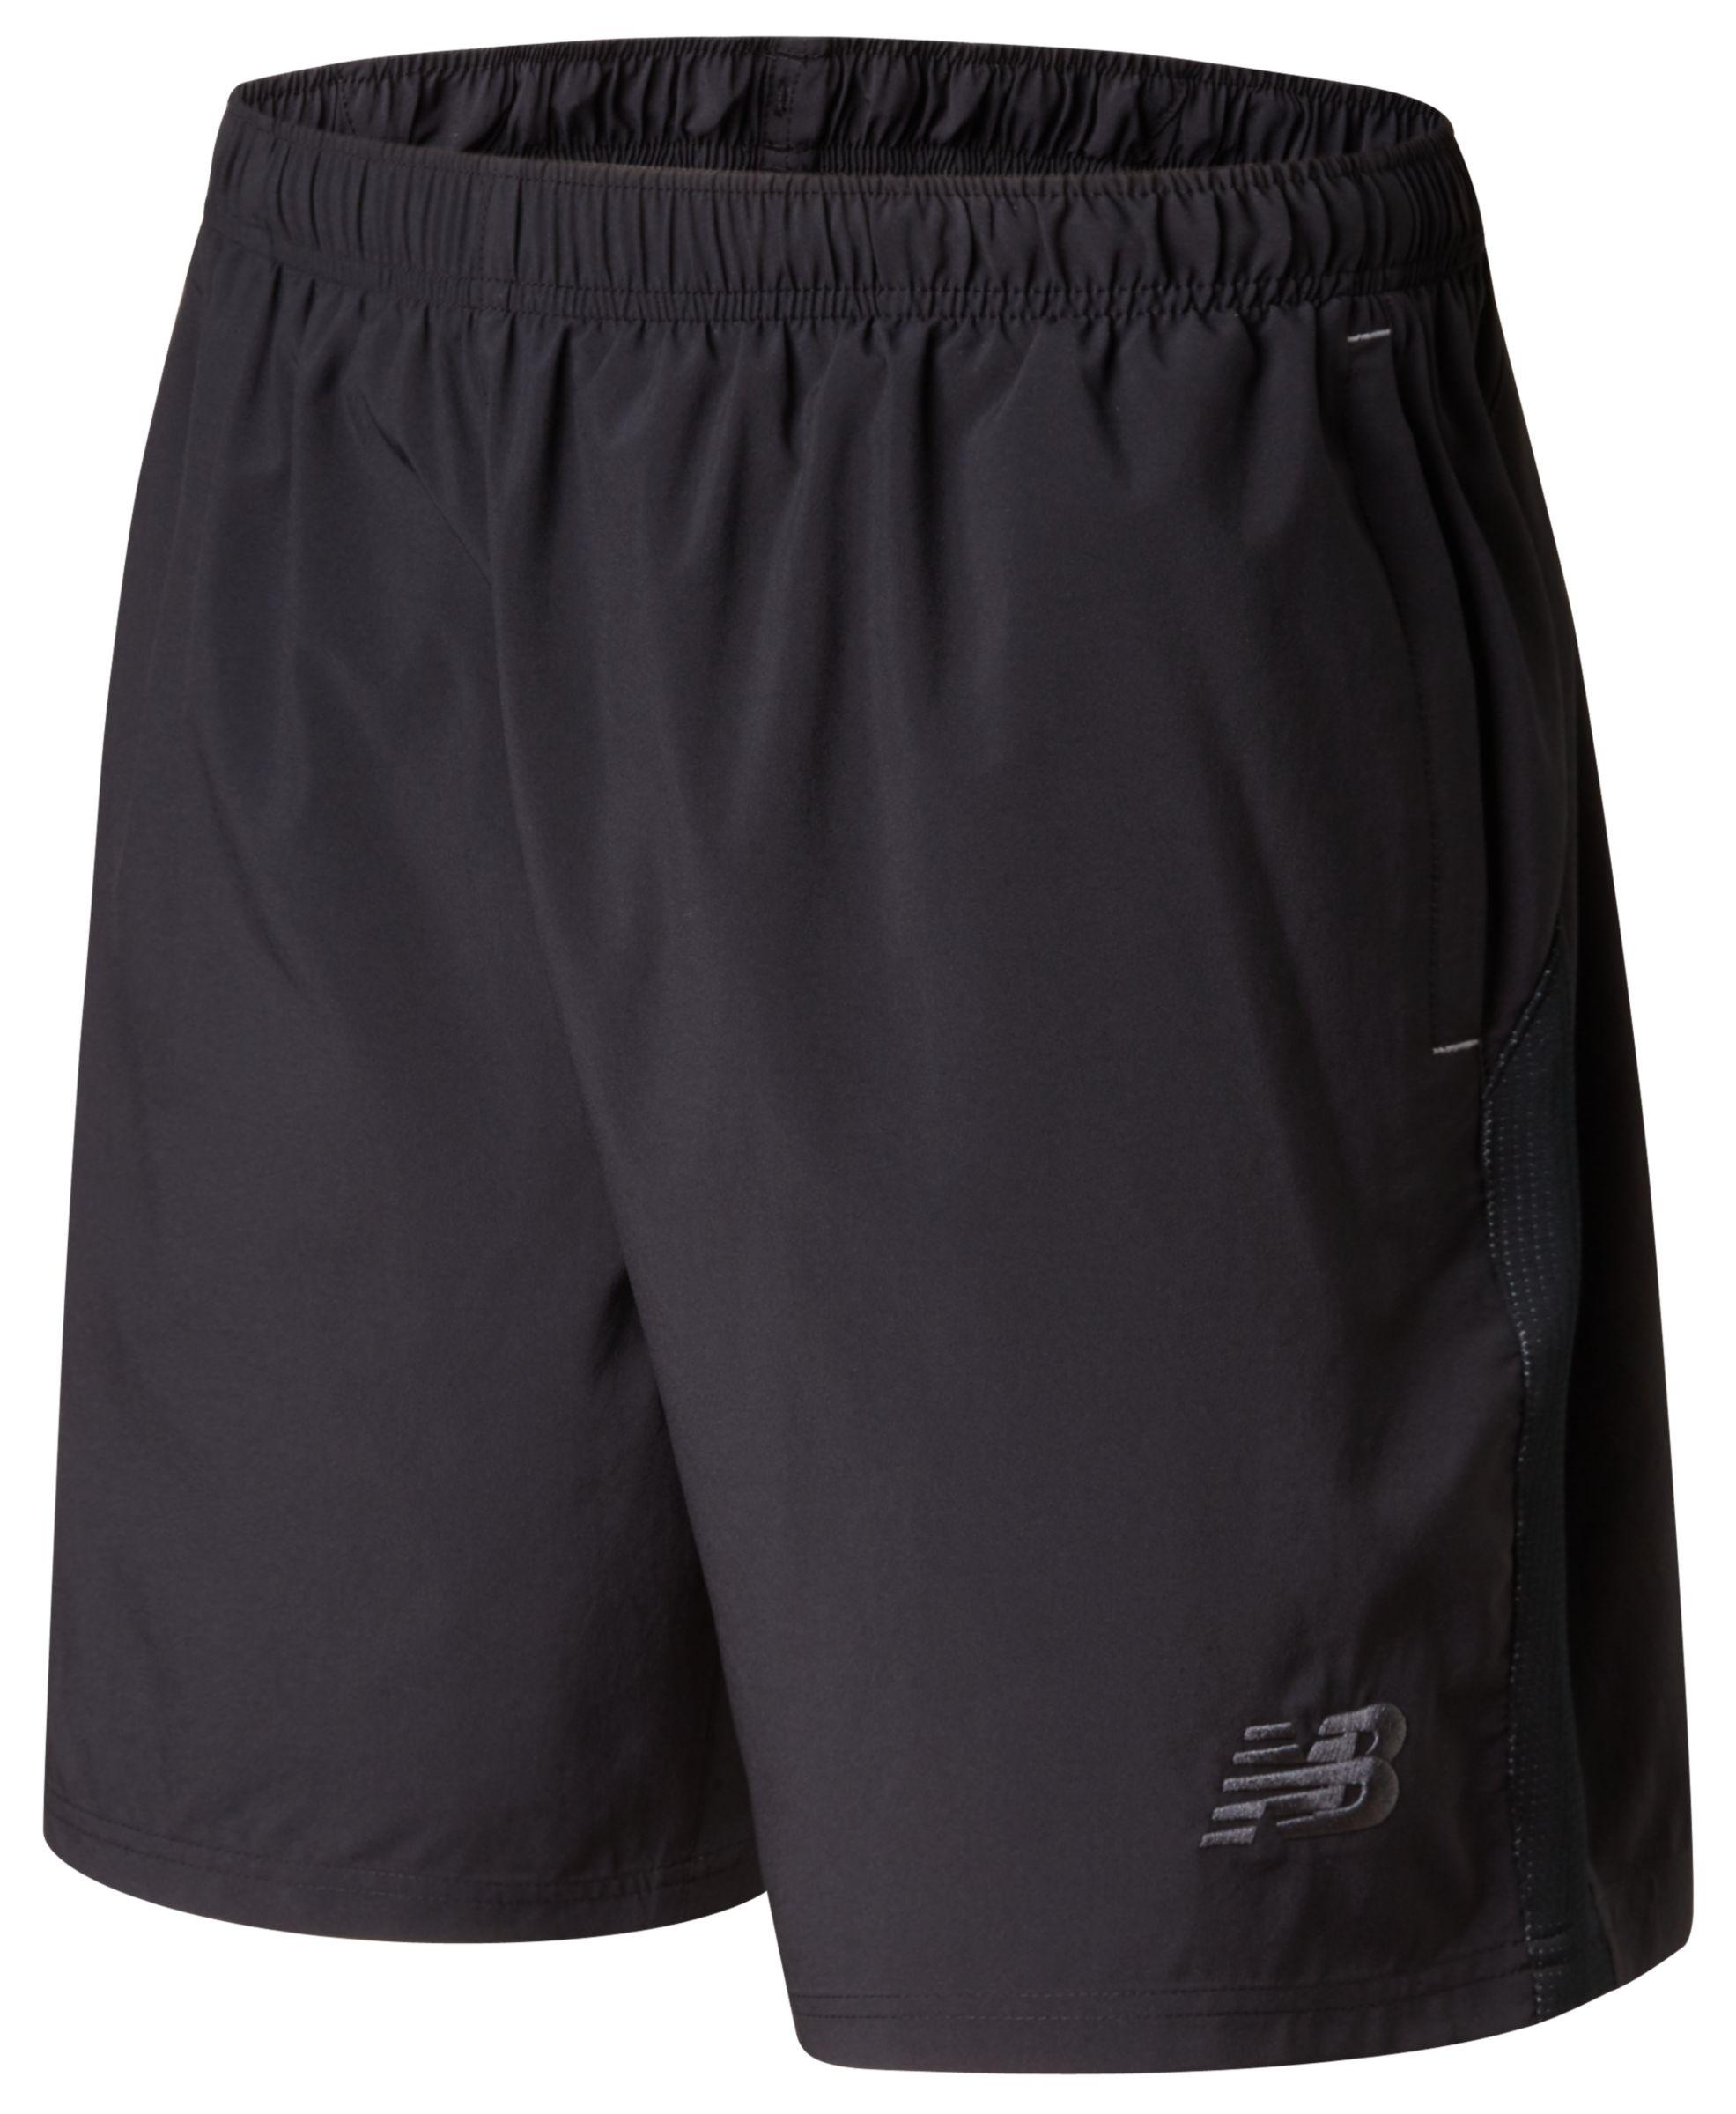 NB LFC Elite Training Short - Pockets + Jonk, Black